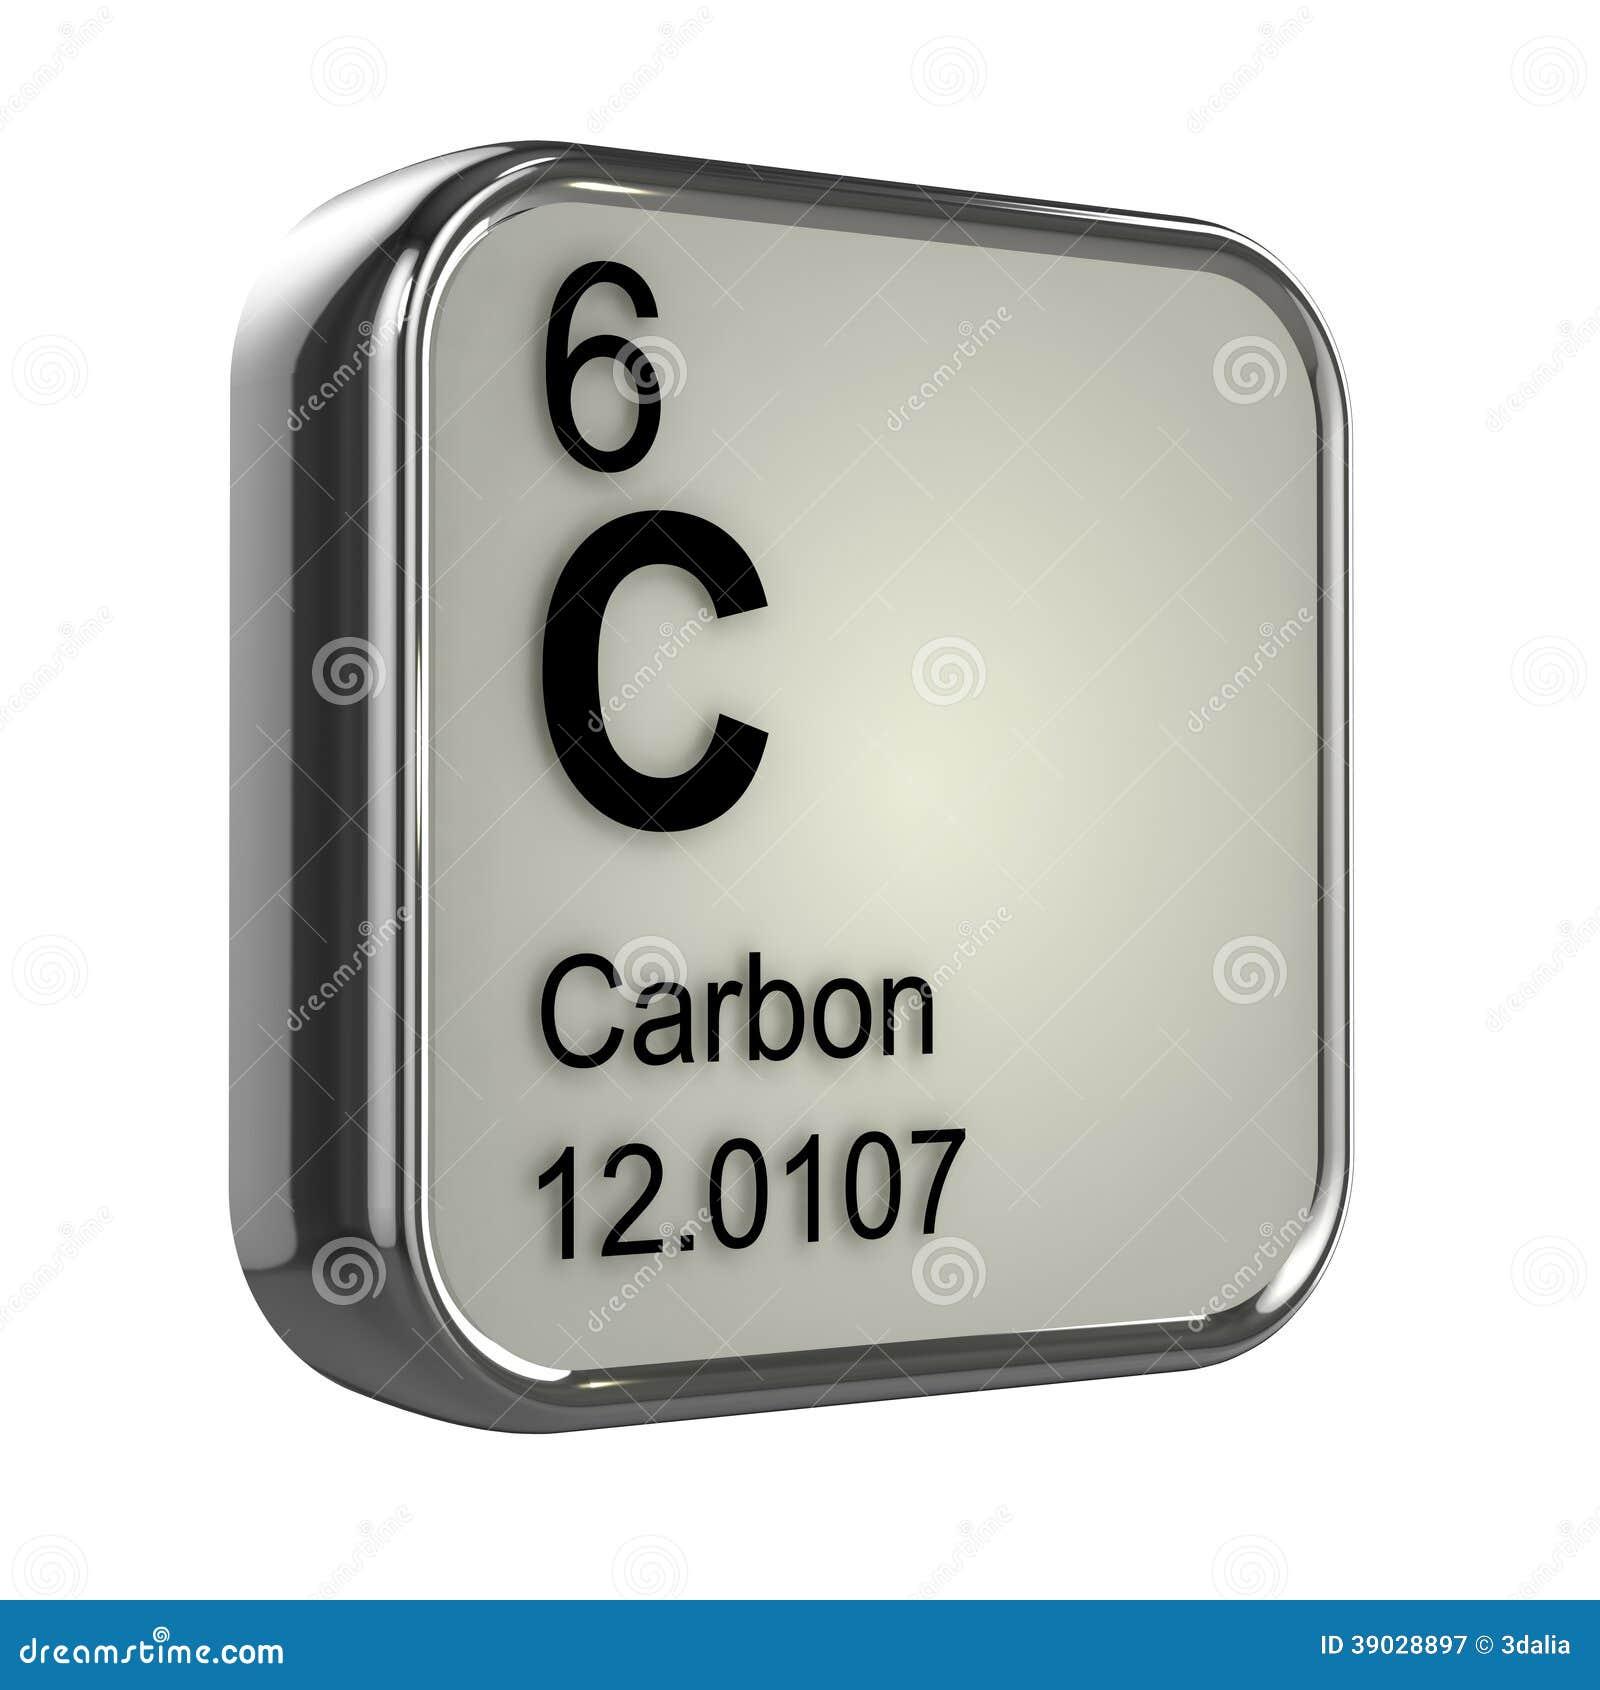 Fotografa De Archivo Libre De Regalas Elemento Del Carbono D Image39028897 on Oxygen Periodic Table